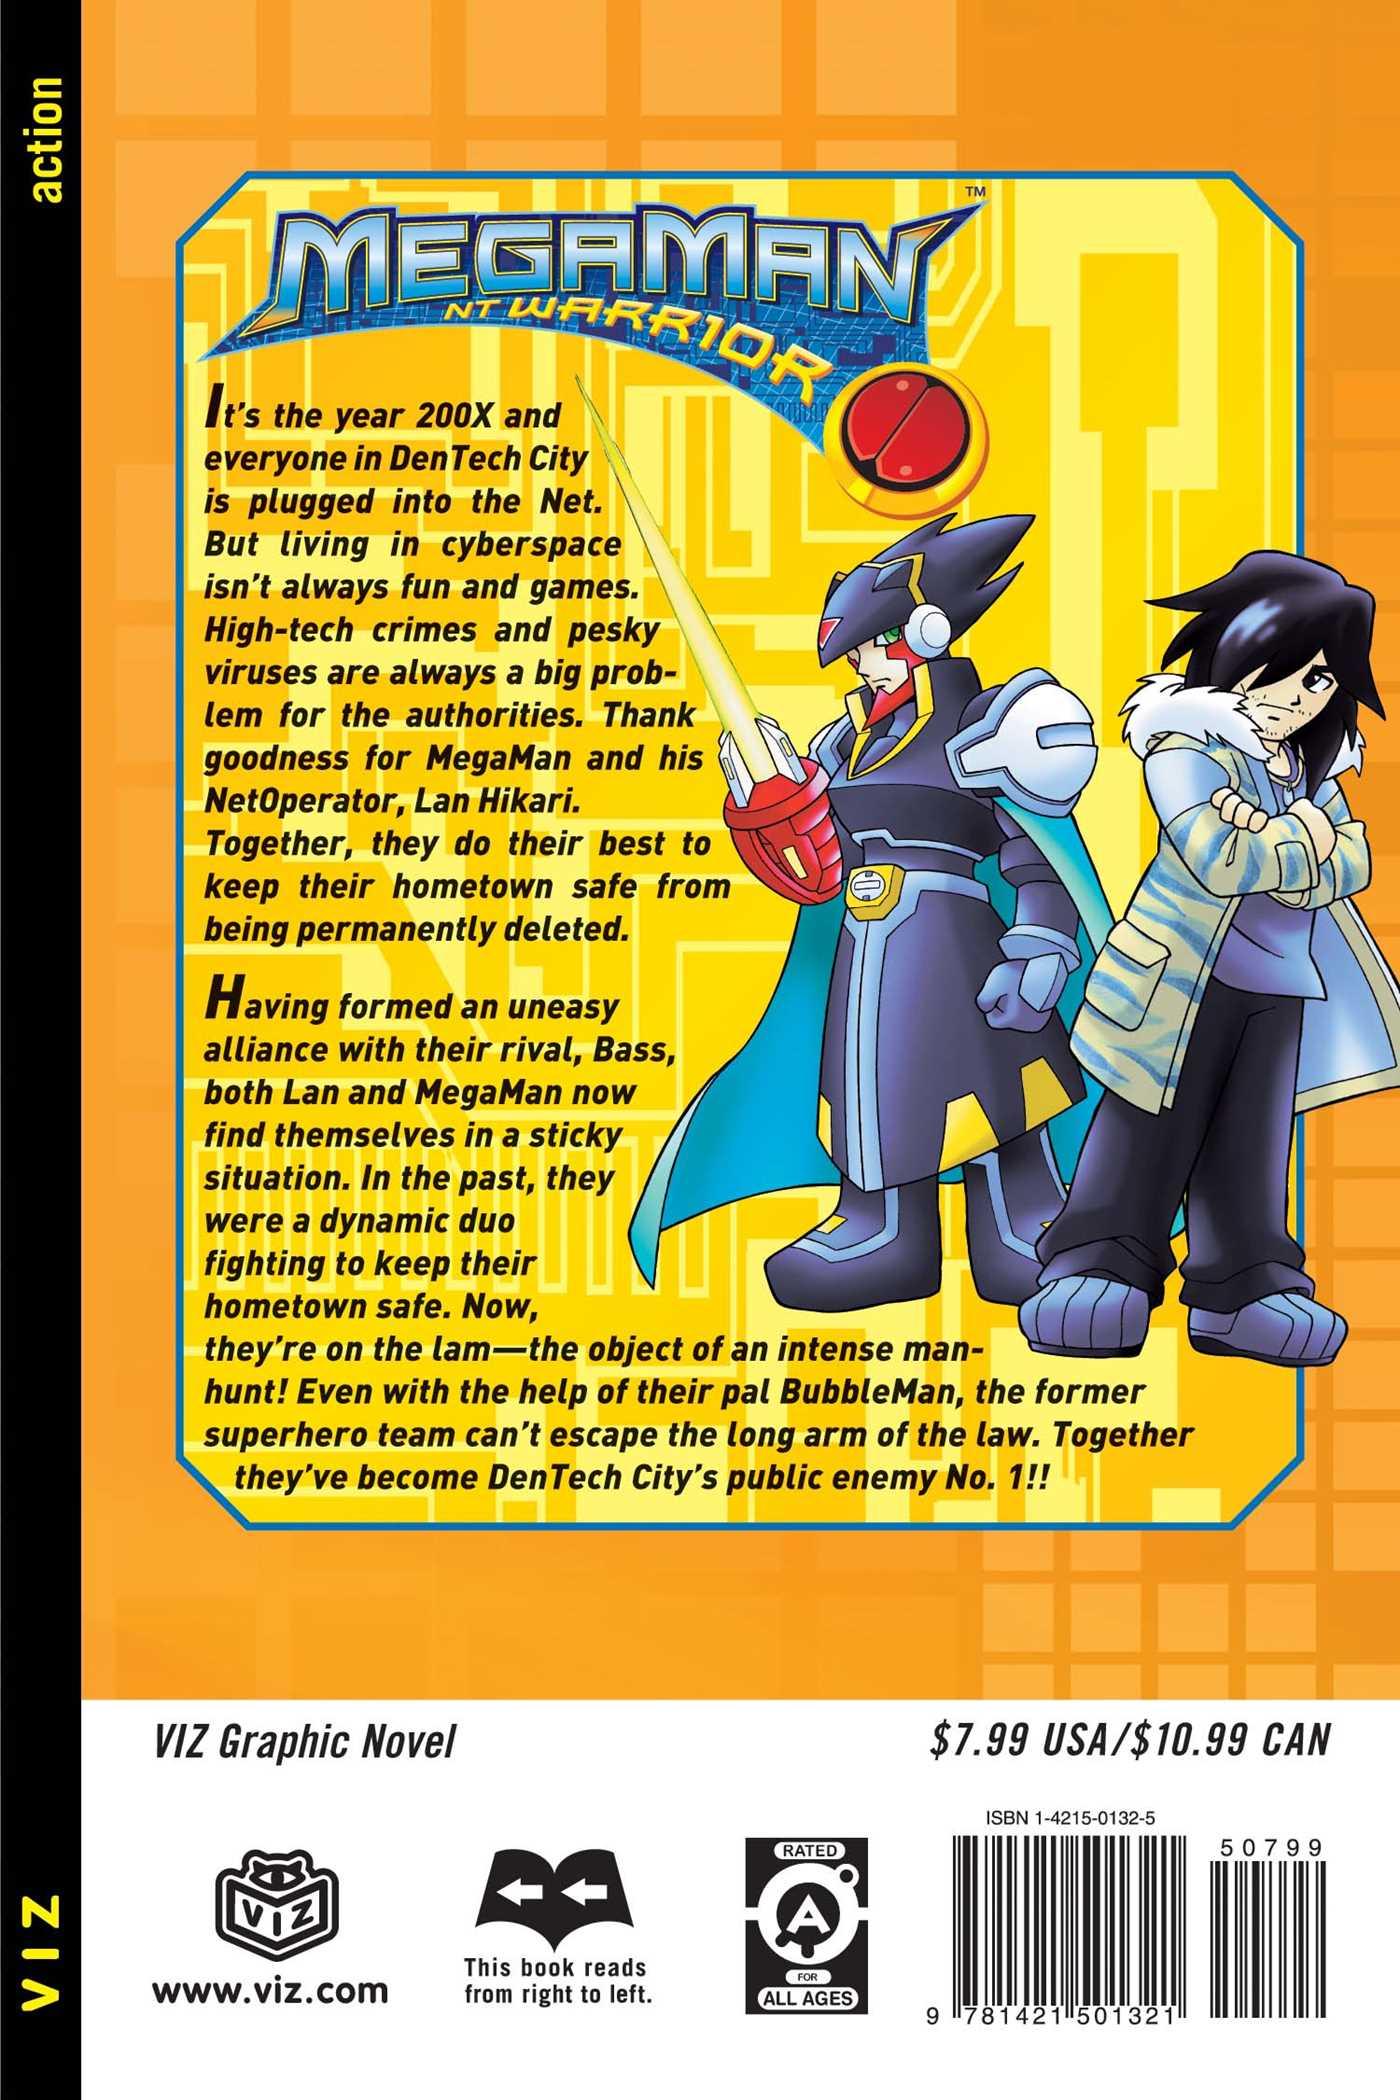 Megaman NT Warrior #13 - Vol 13 (Issue)